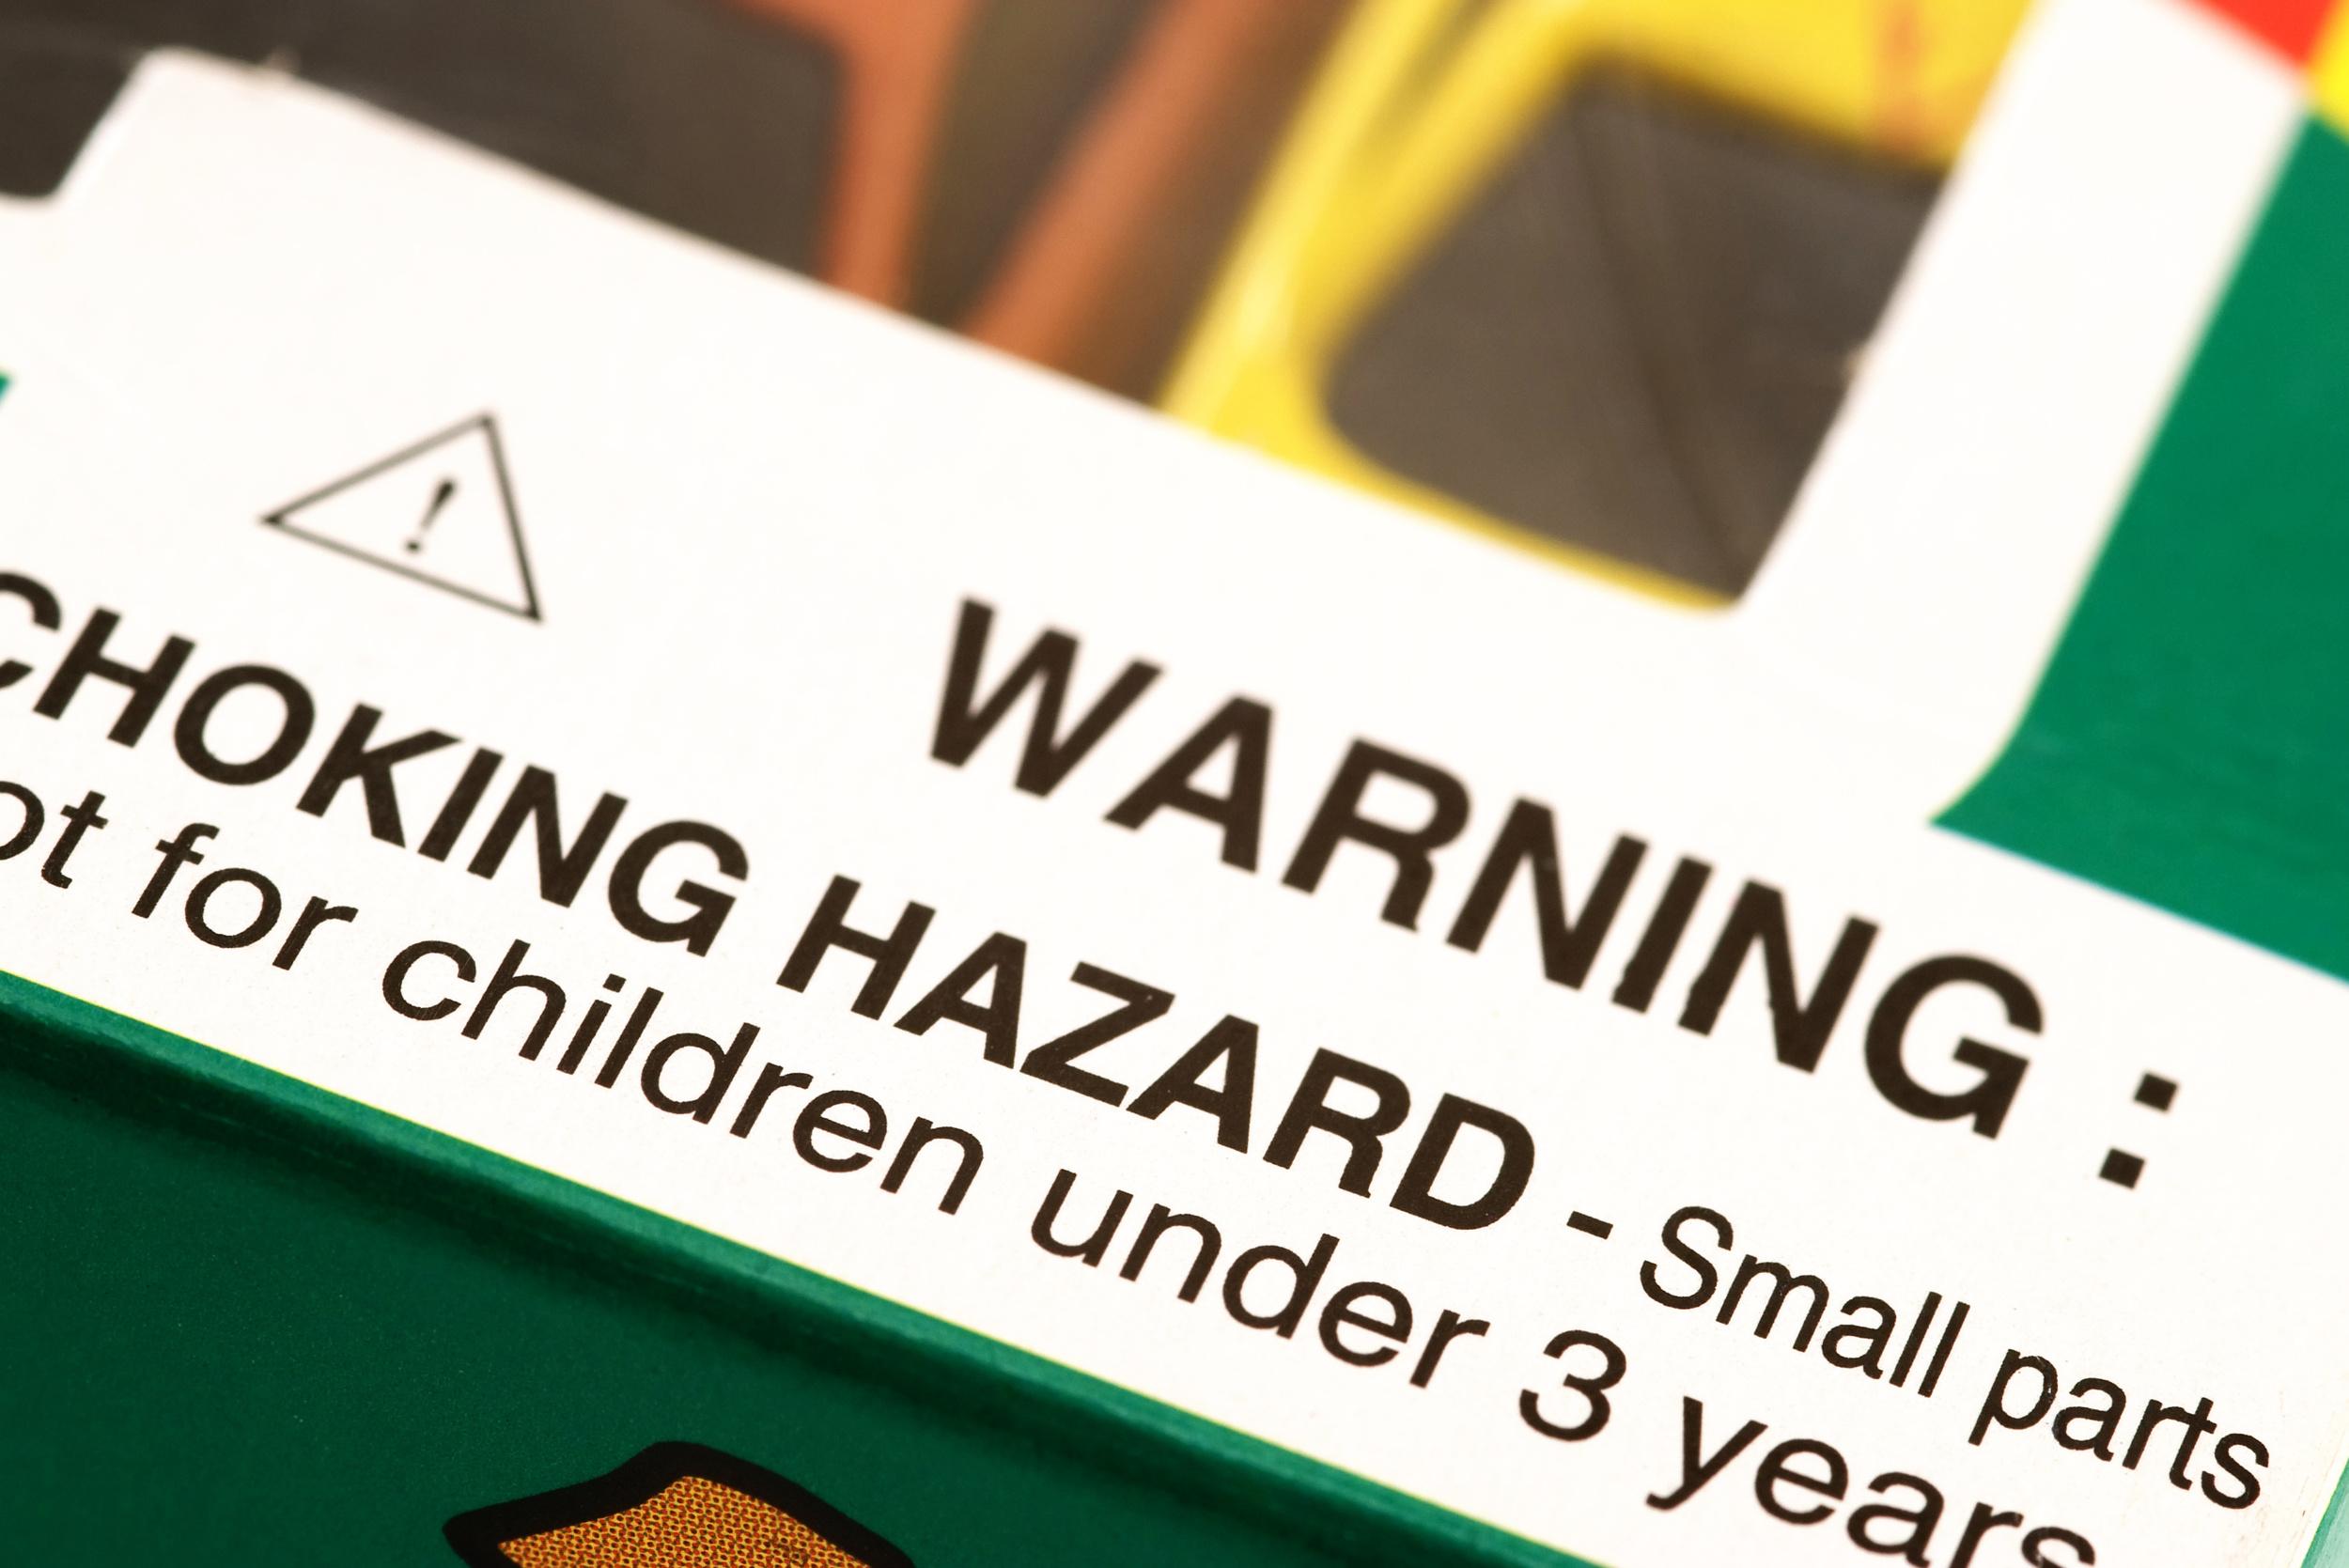 Proofed baby safety, choking hazard, small parts warning, baby proofing tips, childproofing tips, babyproofing advice